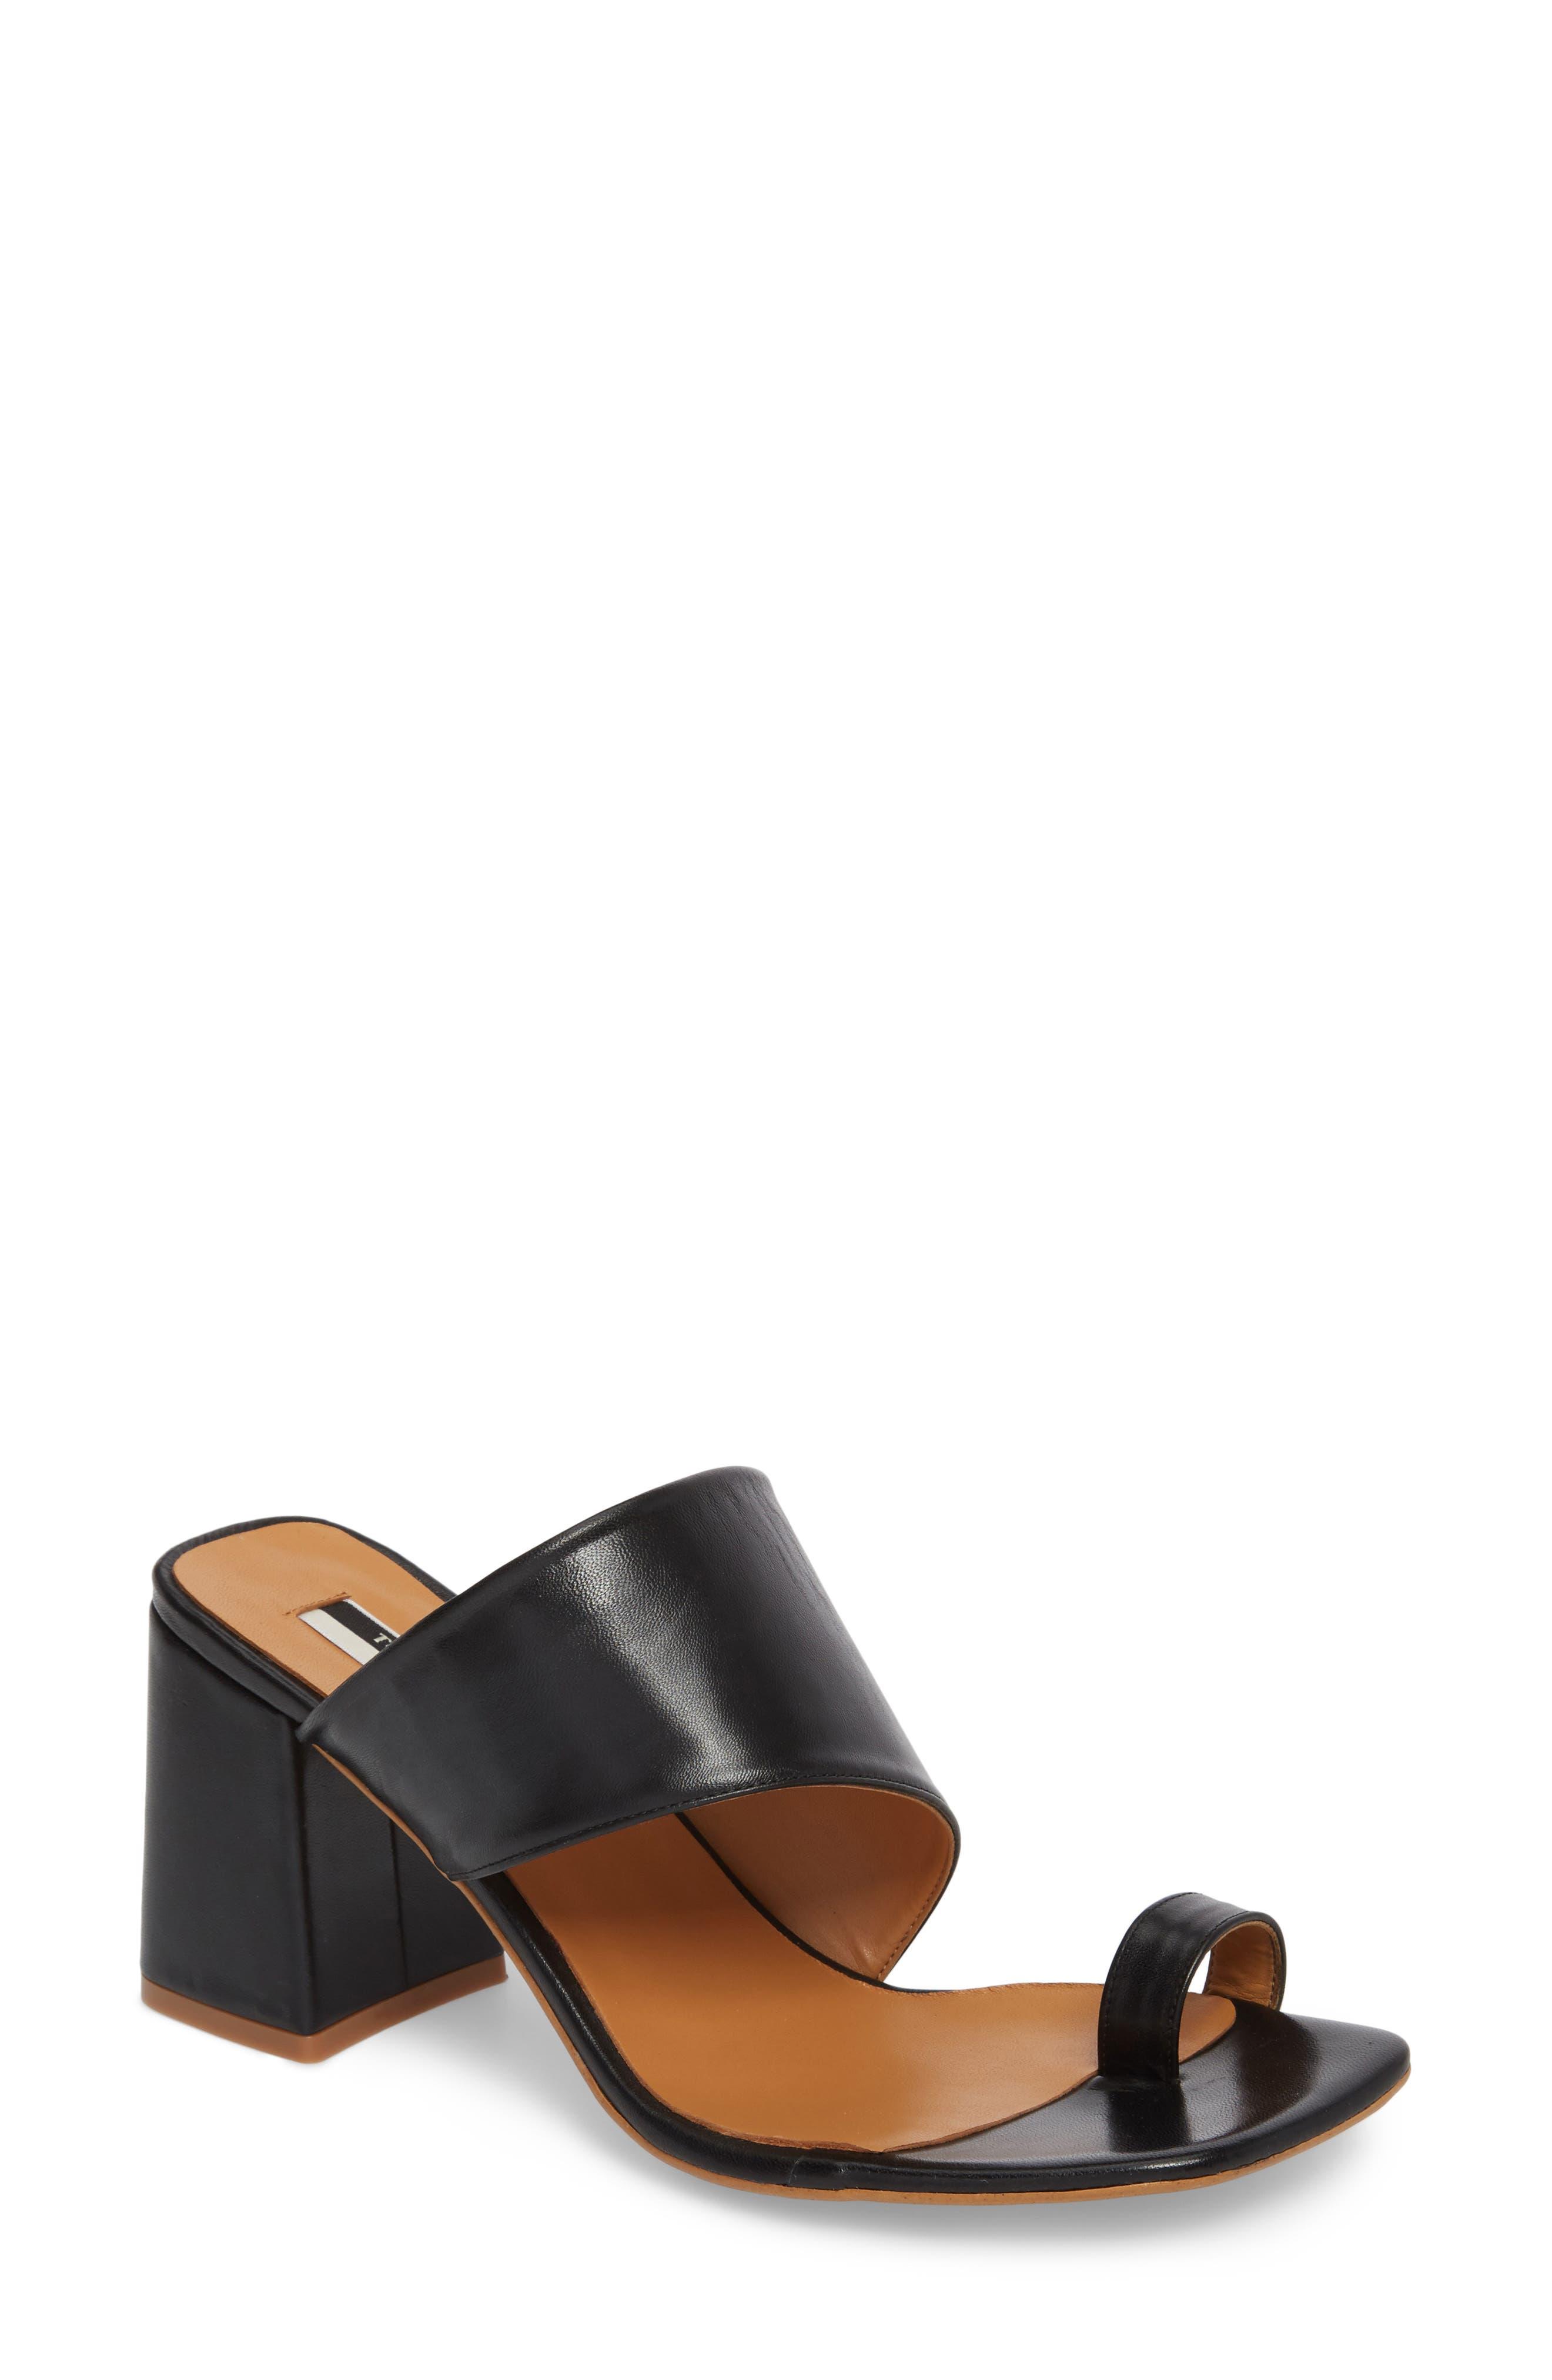 Nimble Toe Loop Slide Sandal,                             Main thumbnail 1, color,                             Black